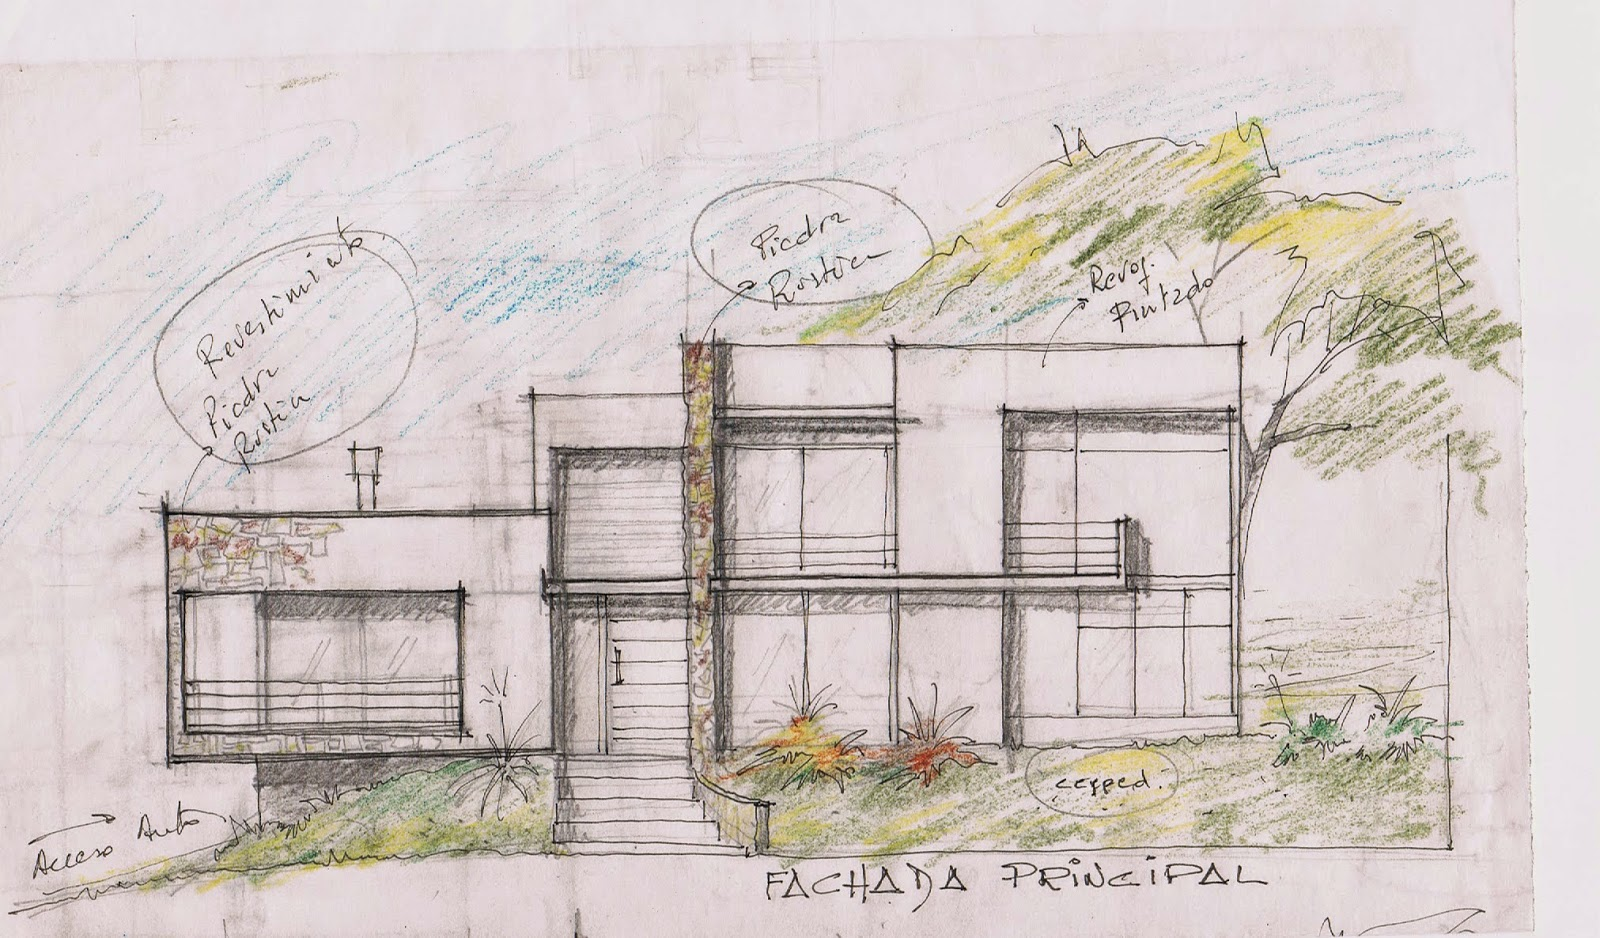 Casa en barrio jardin arquitecto roque e paulino - Interiorismo de casas ...